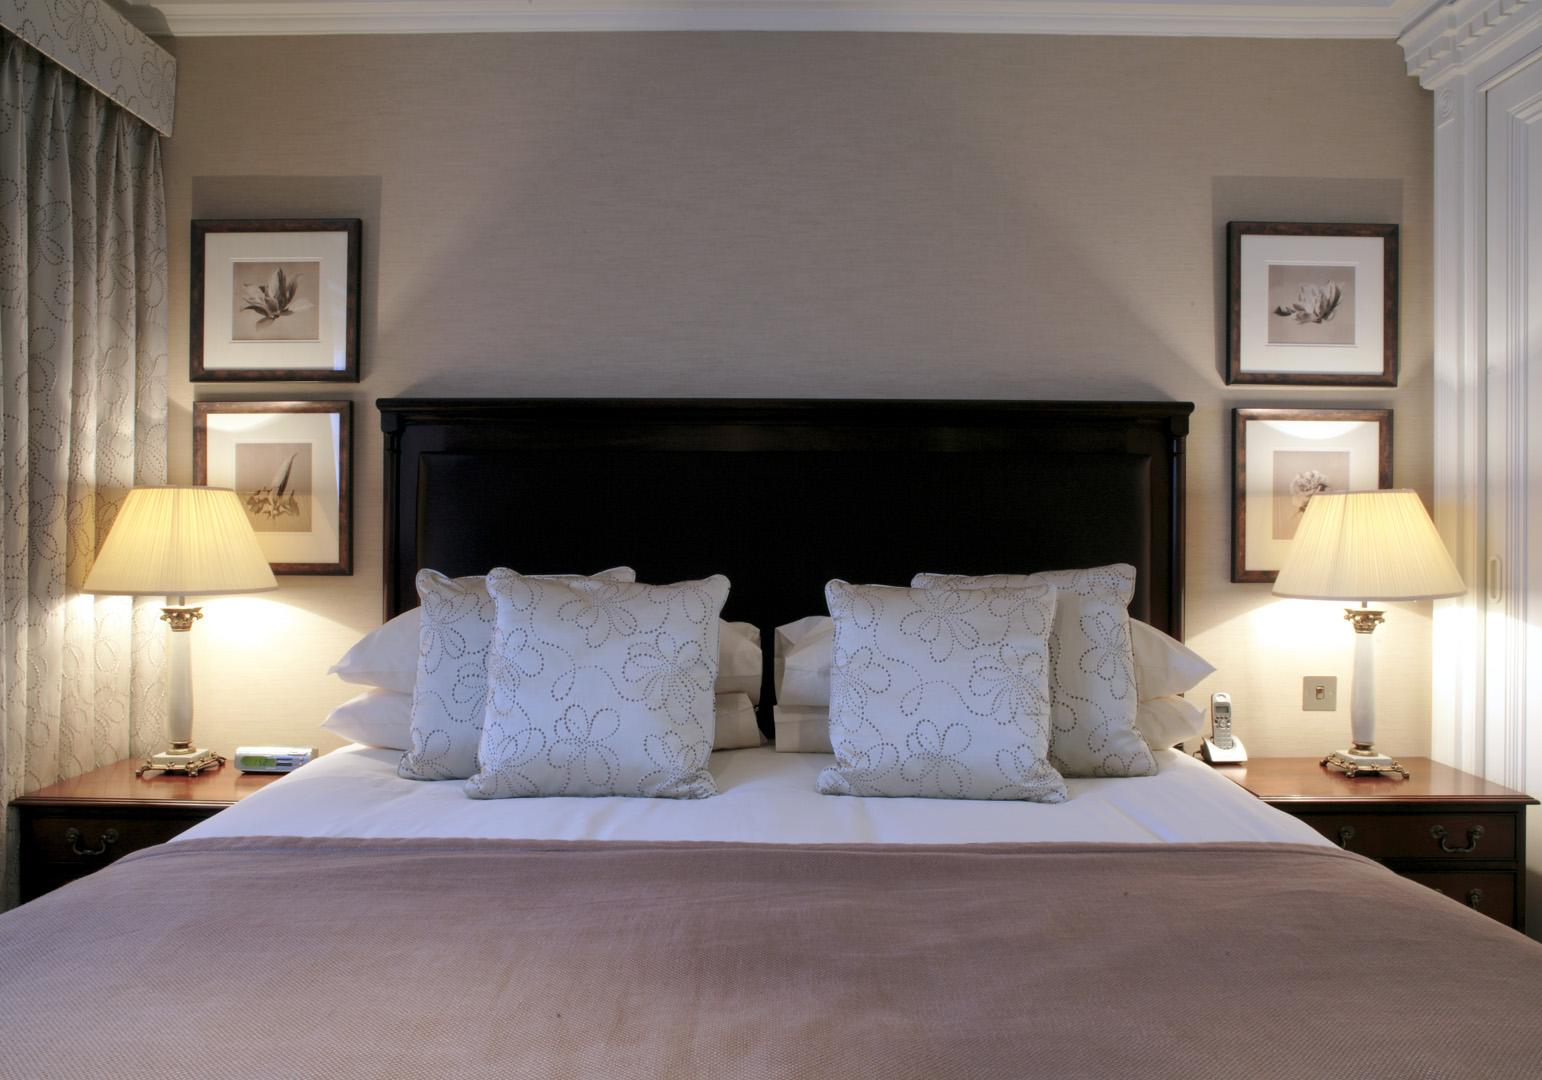 Bed at 148 Cheval Brompton Road, Knightsbridge, London